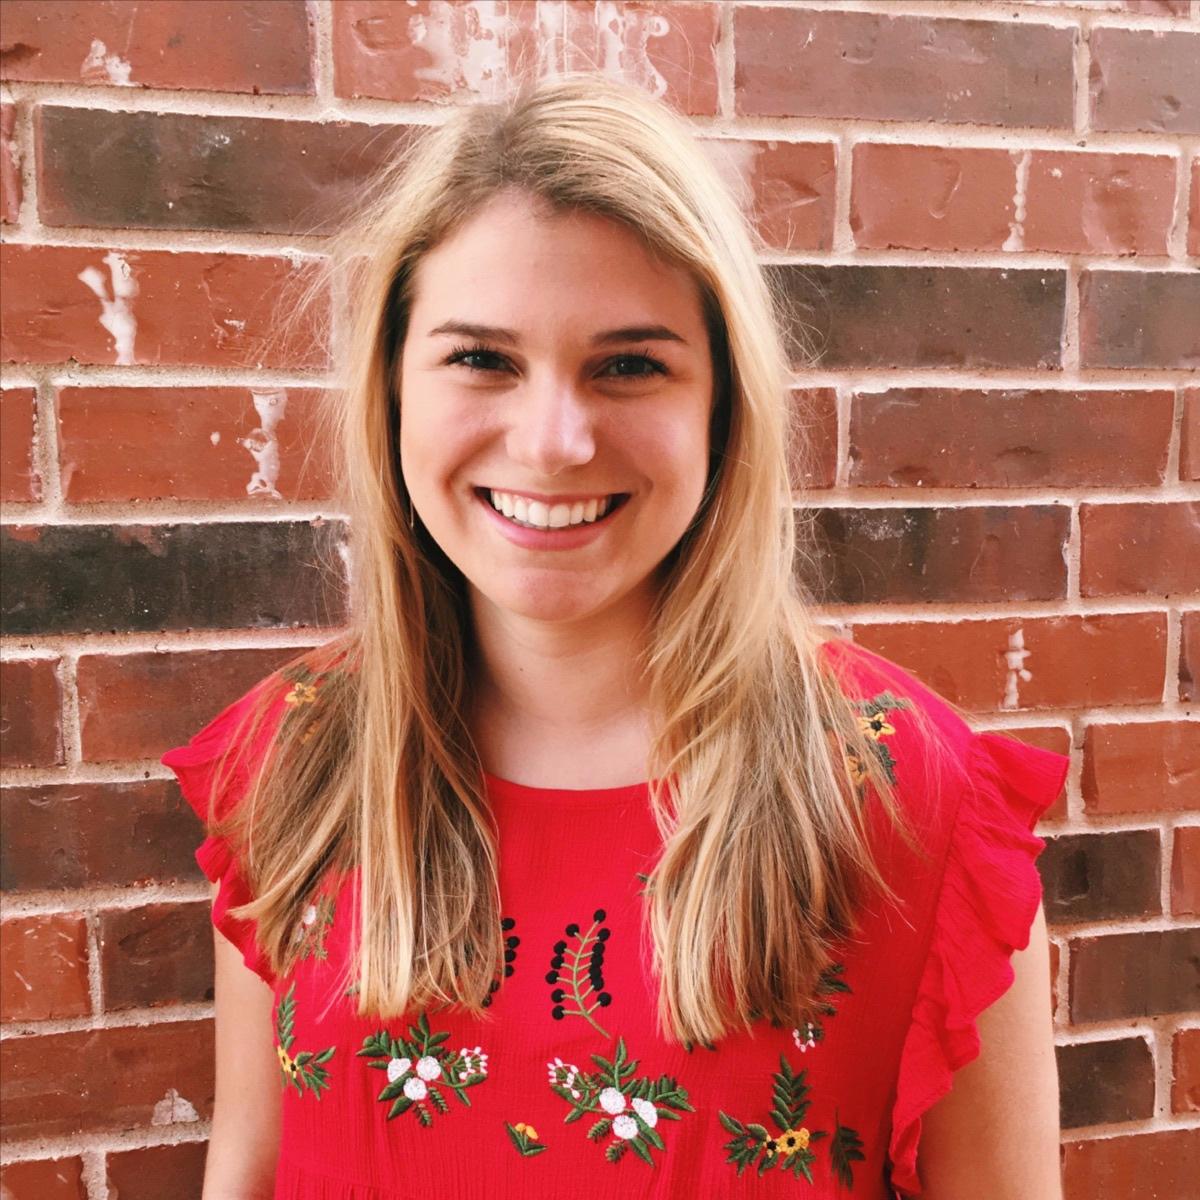 Danae Chamberlain - Danae Chamberlain is from Siloam Springs, Arkansas and a graduate of Baylor University and the Kanakuk Institute.Email: danae.chamberlain@klife.com